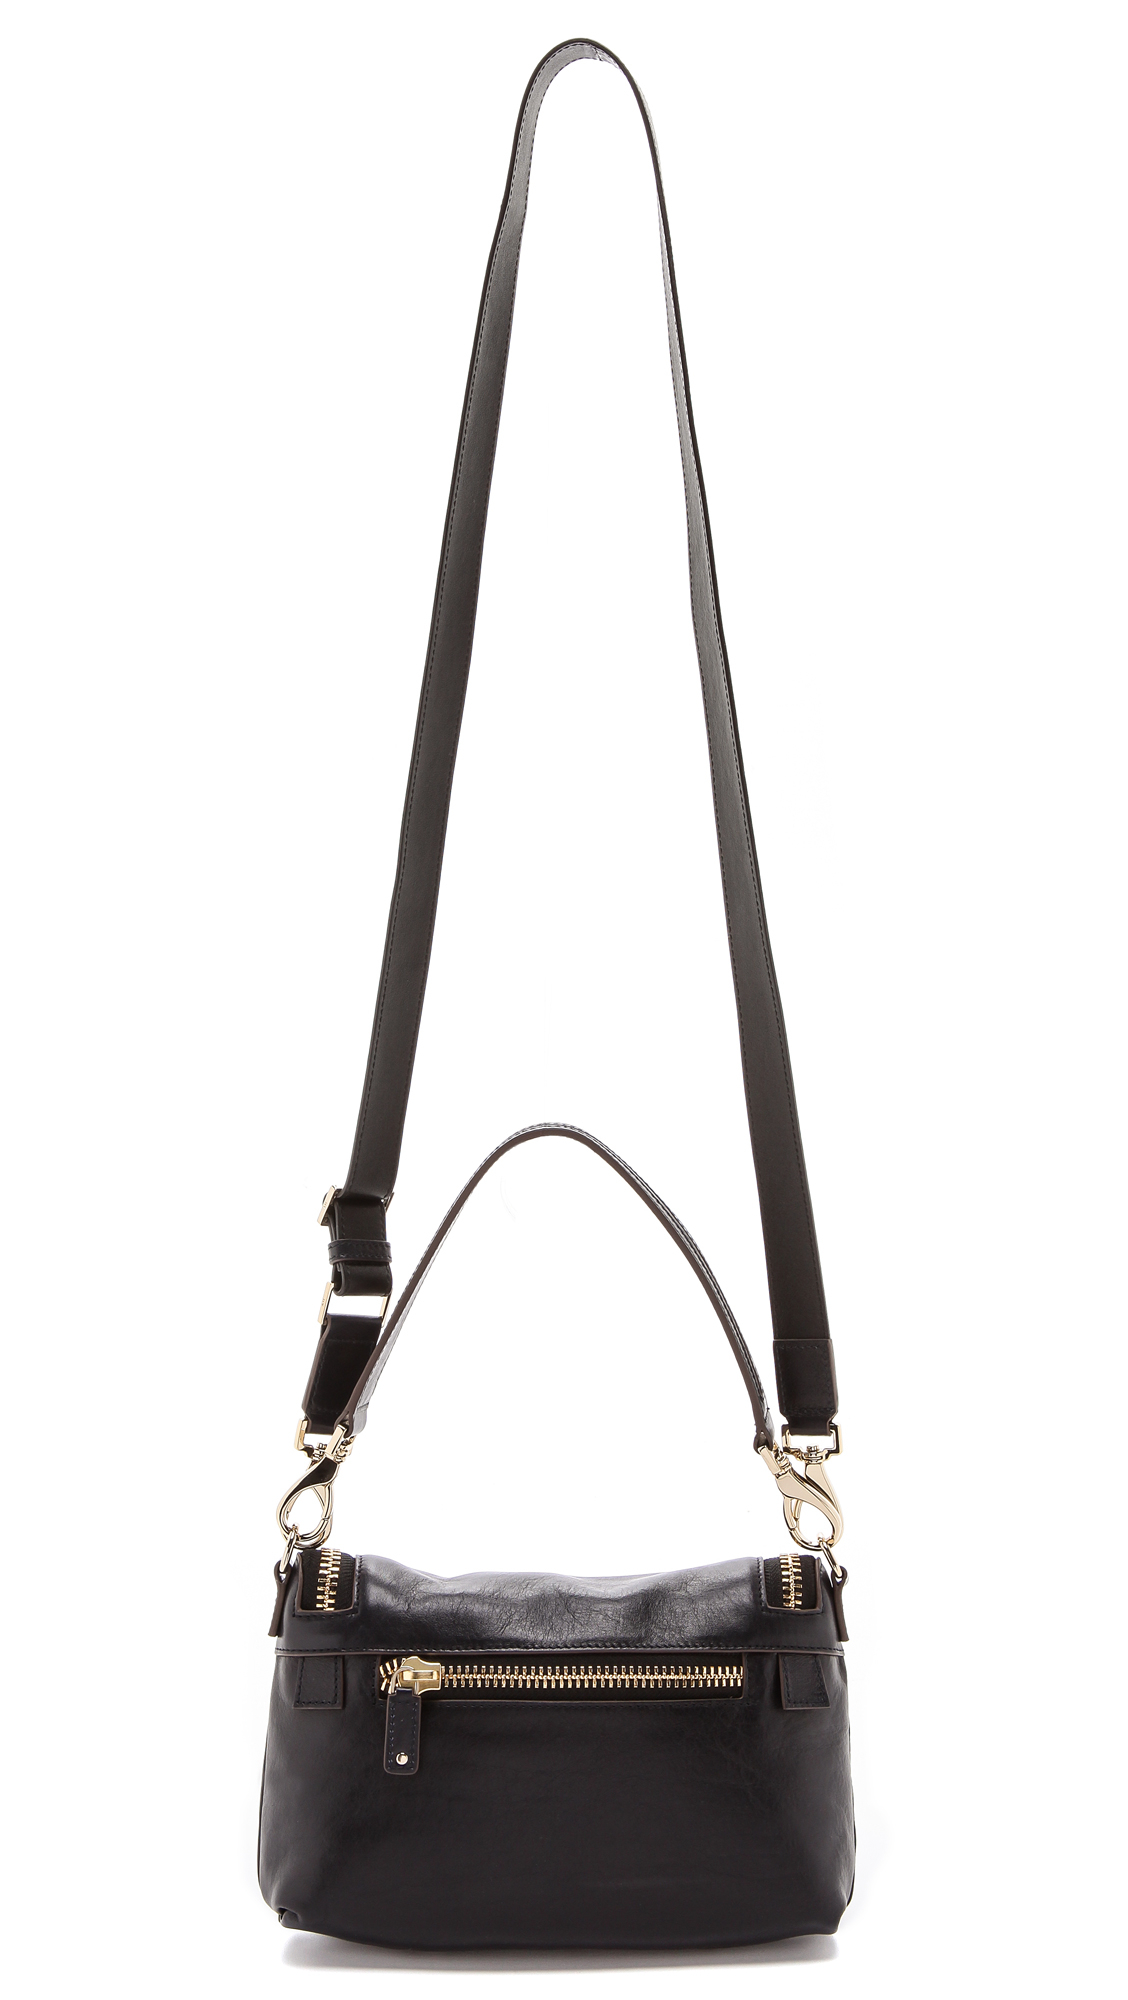 Anya Hindmarch Maxi Zip Cross Body Bag in Navy (Blue)